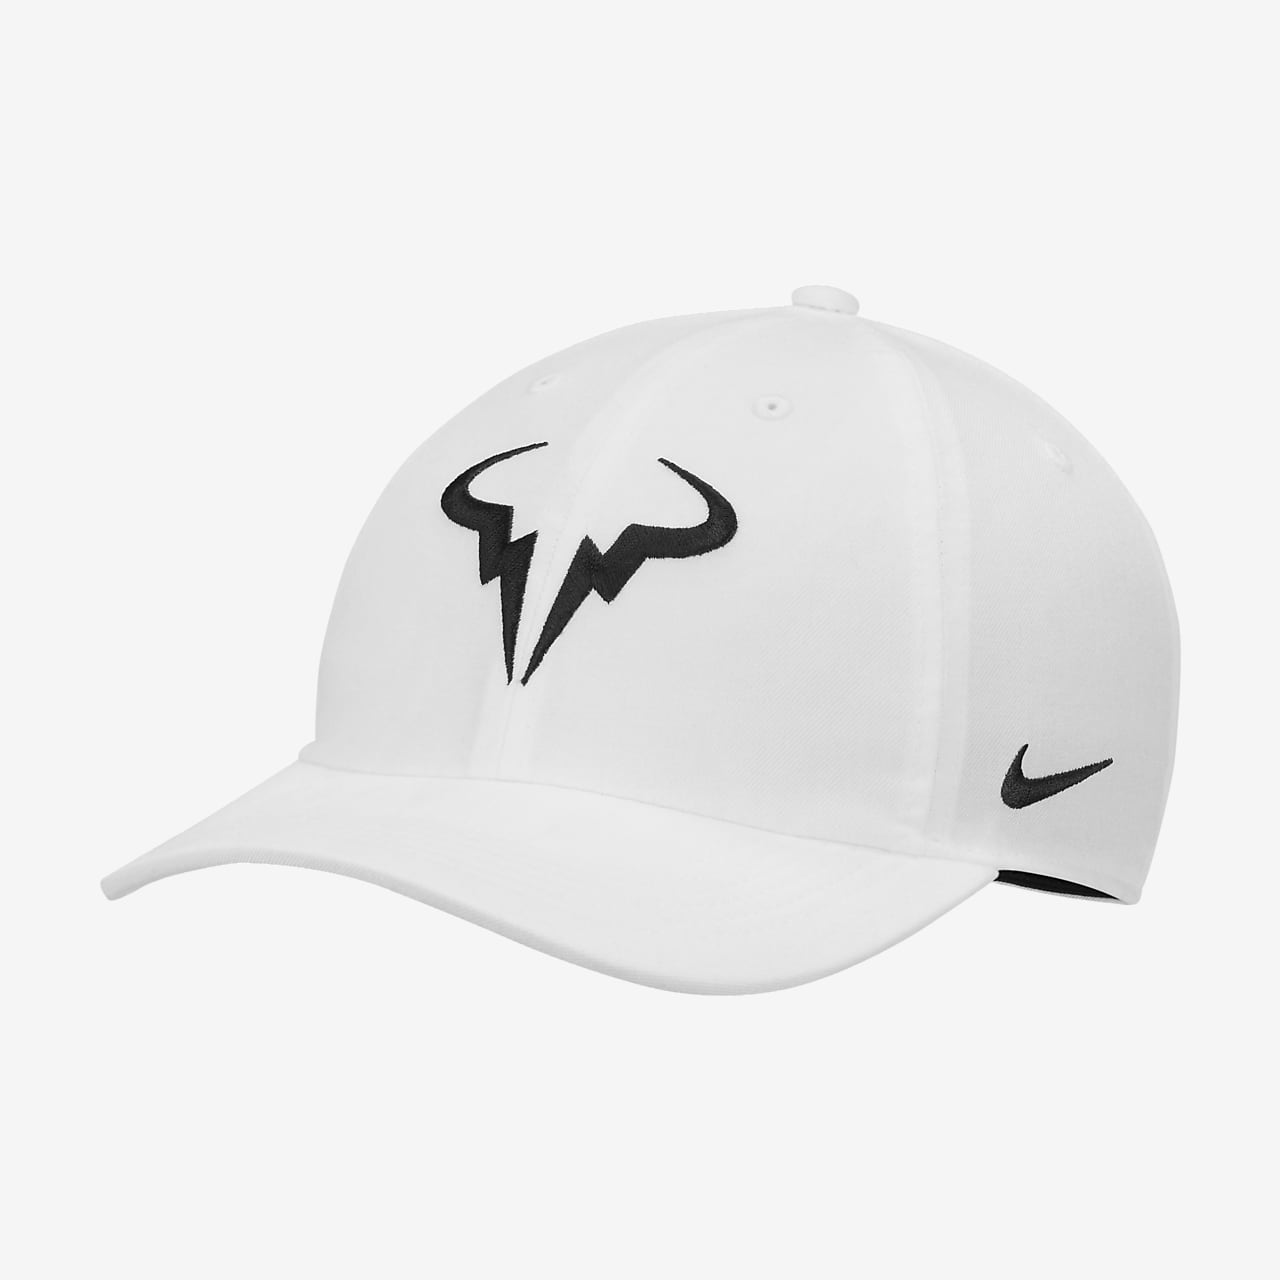 7db13c99 NikeCourt AeroBill Rafa Heritage86 Tennis Hat. Nike.com